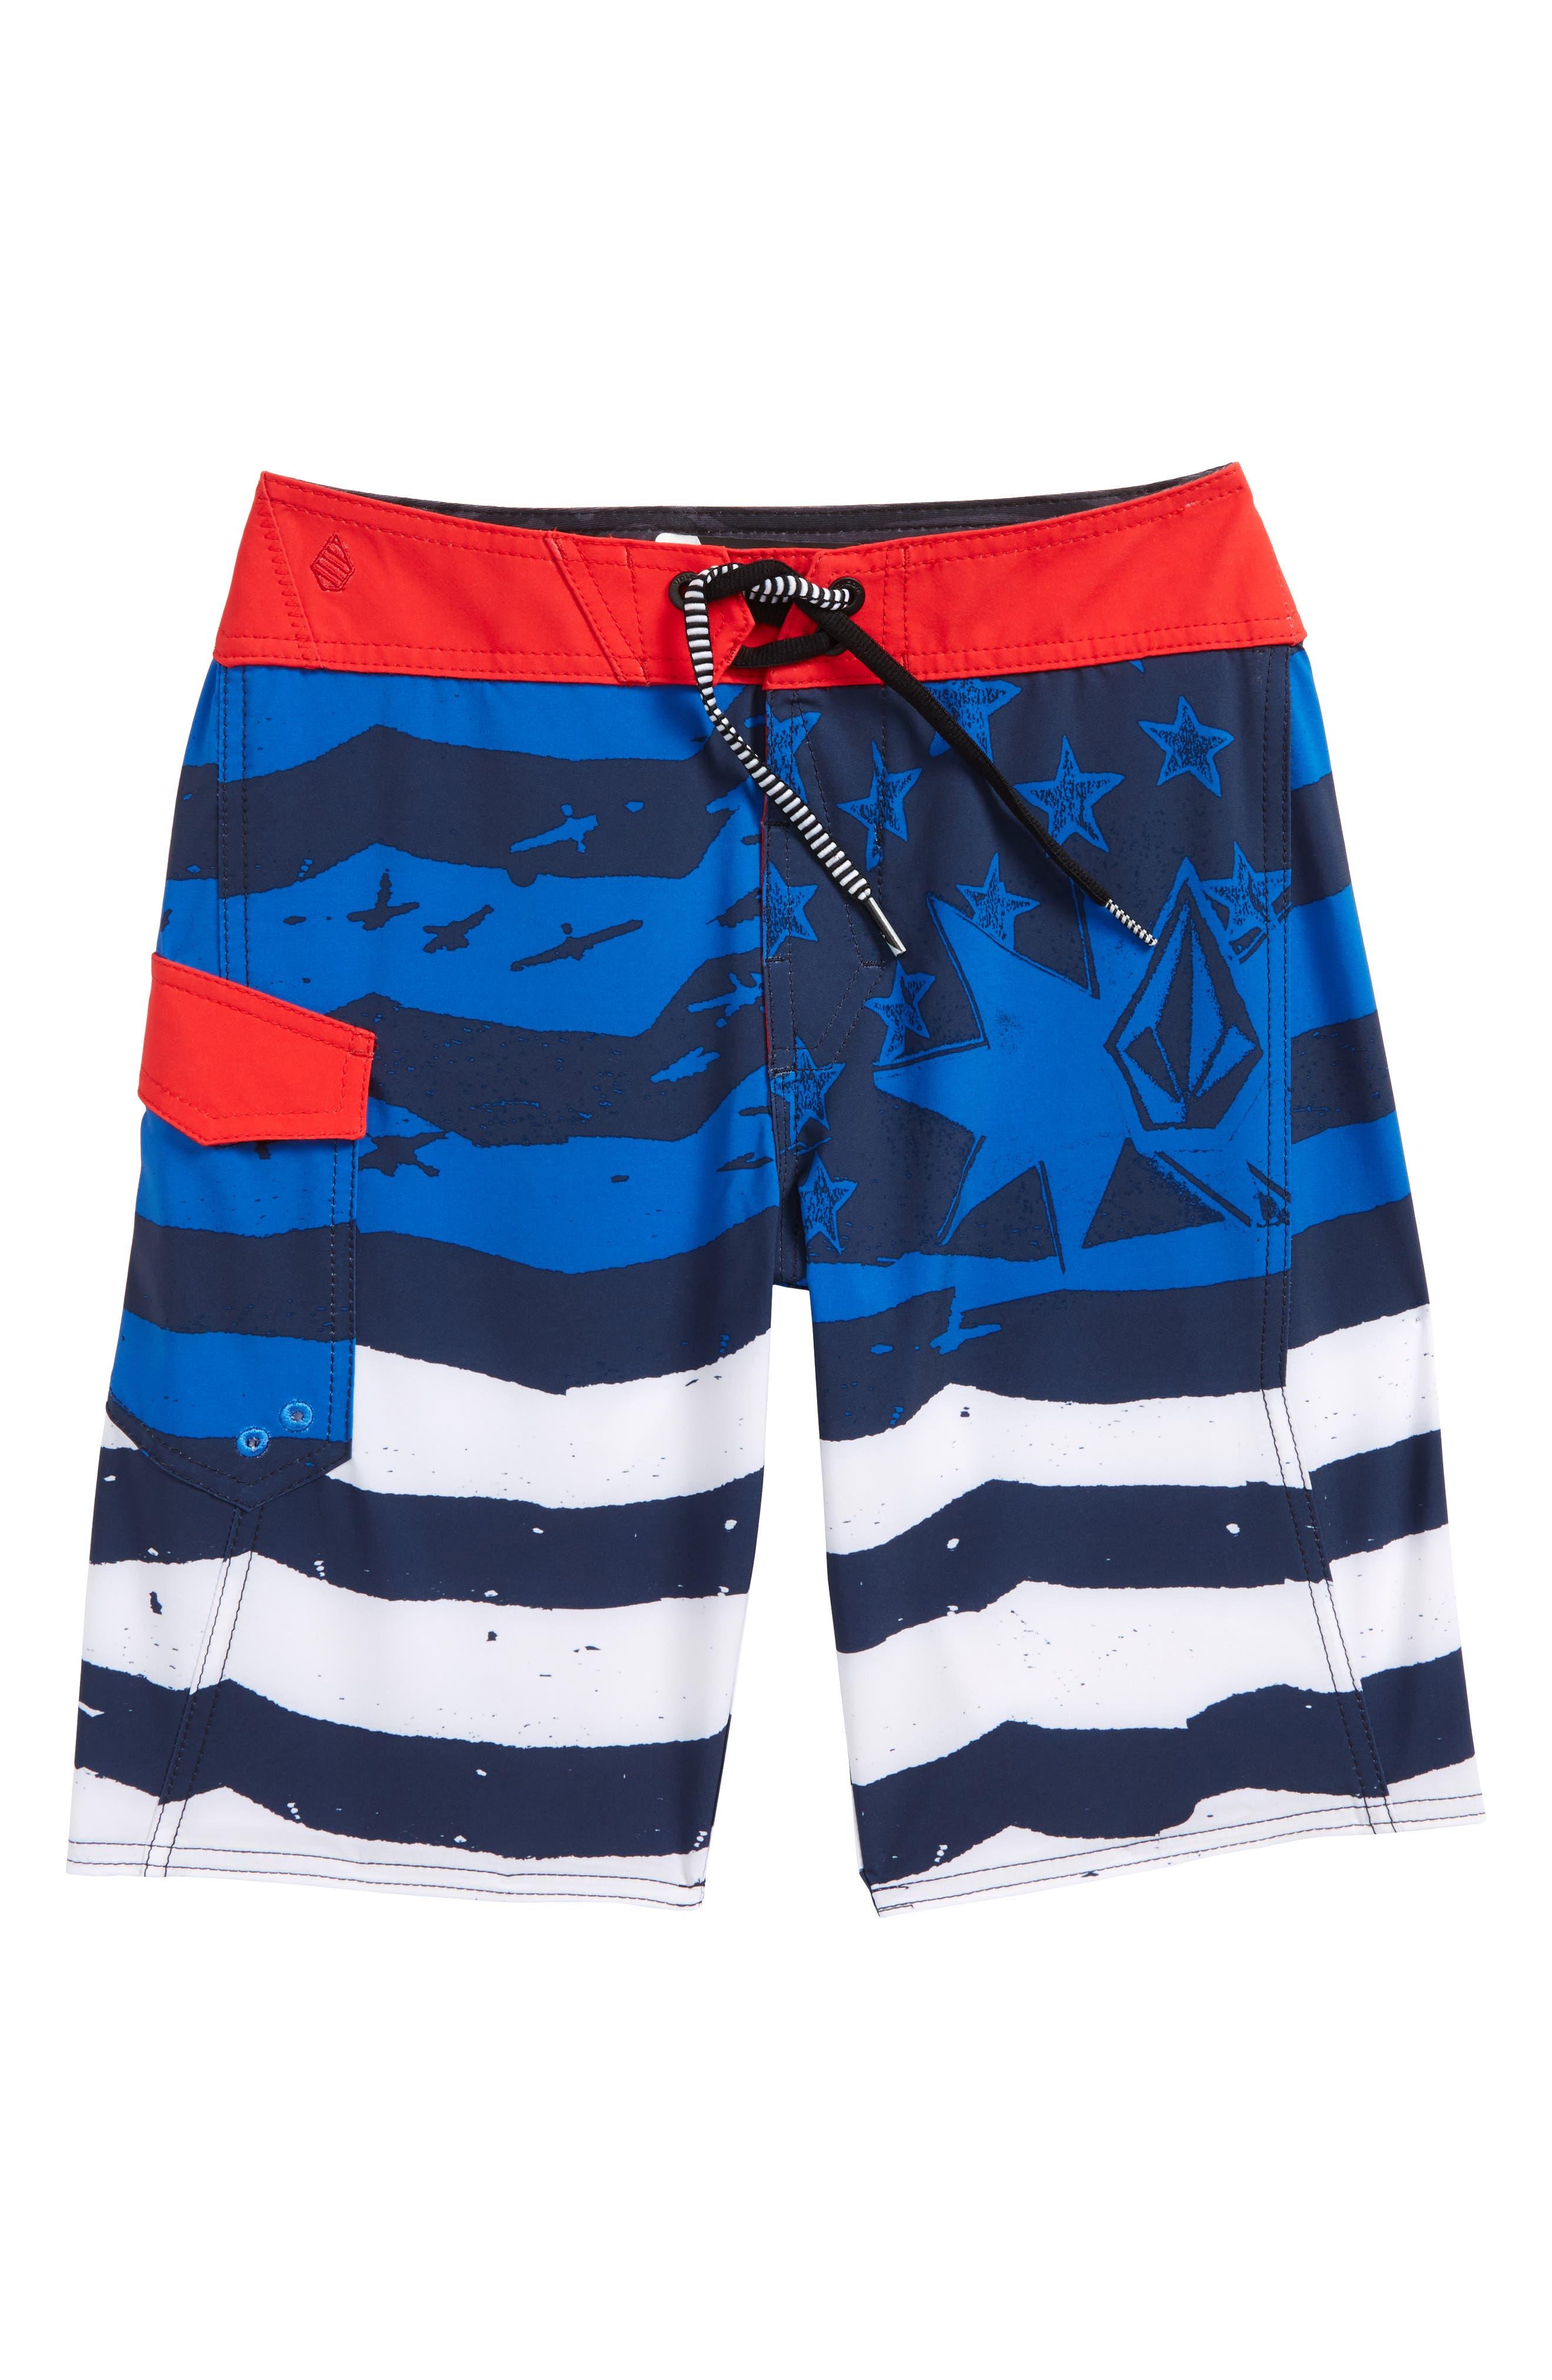 Main Image - Volcom Youth of July Mod Board Shorts (Big Boys)